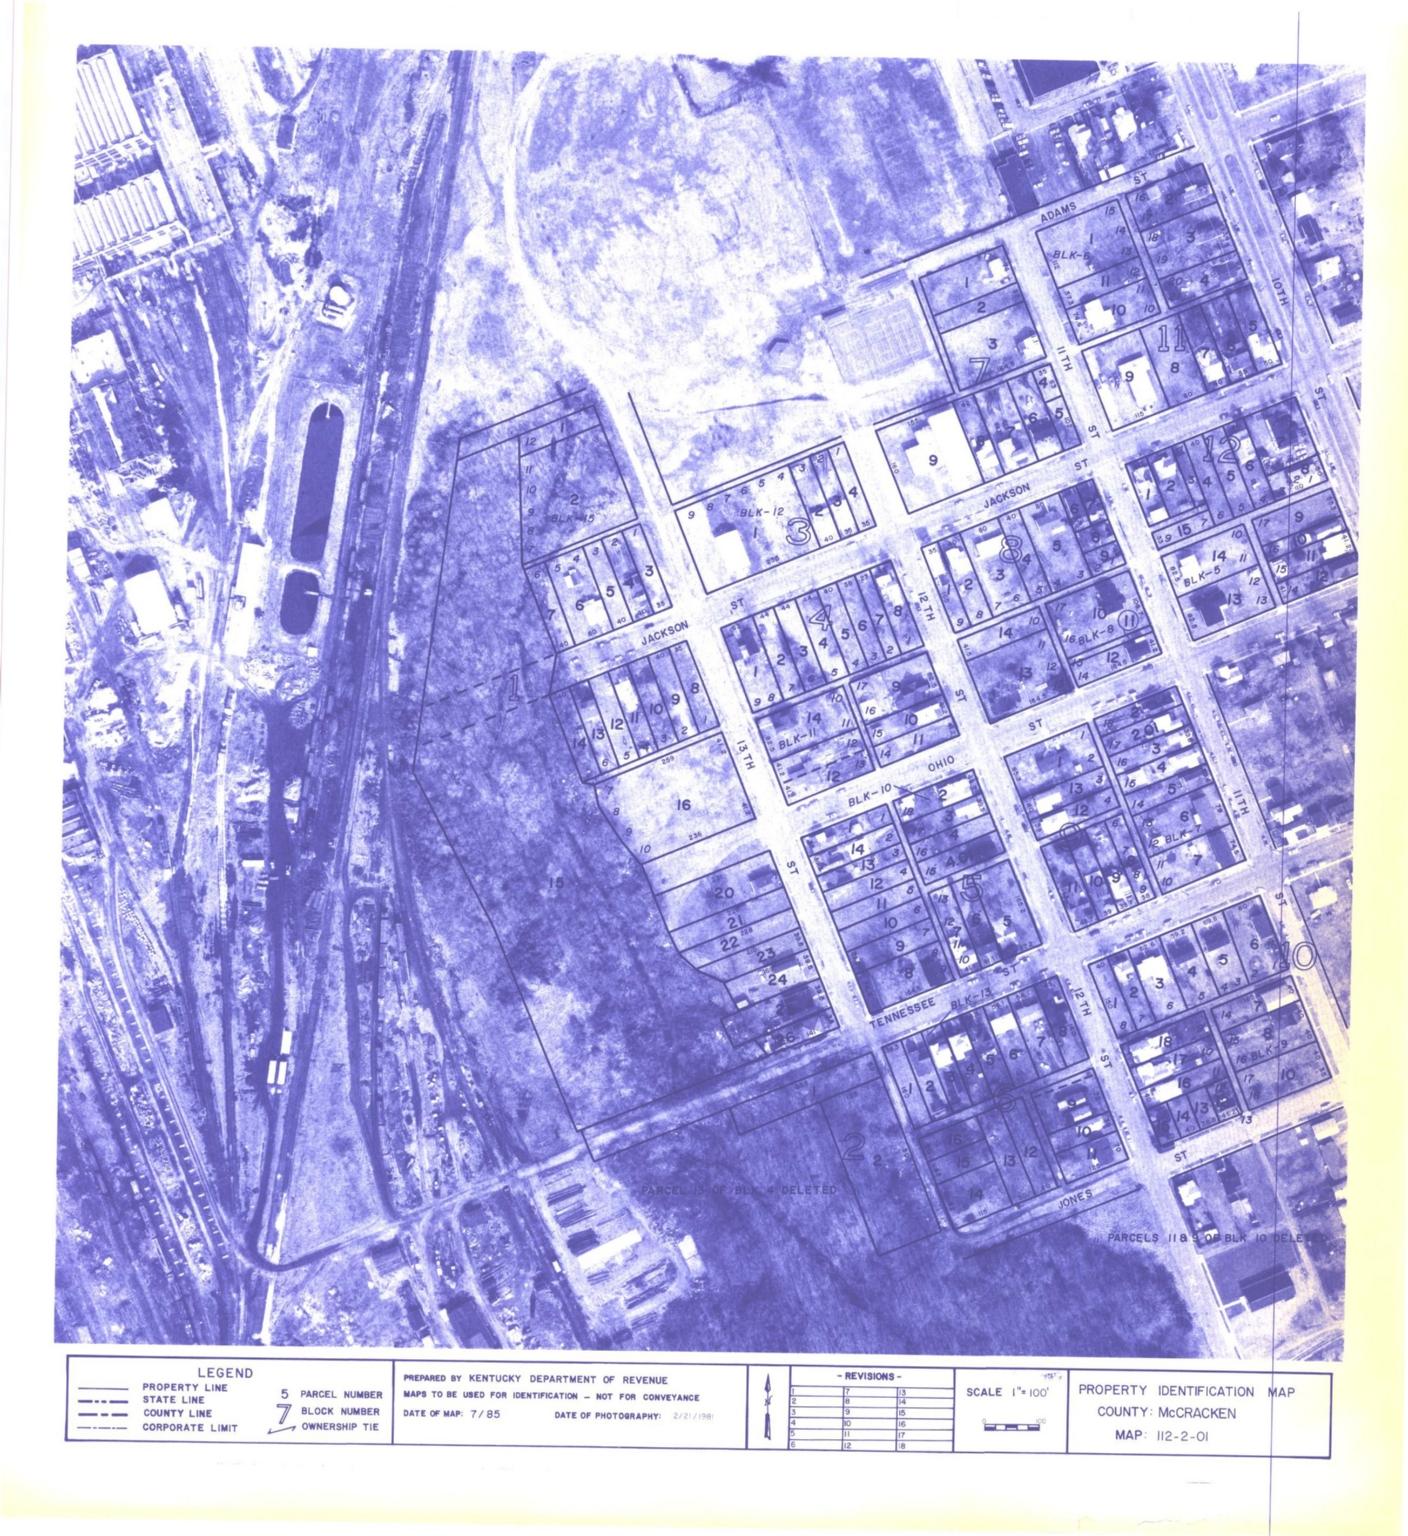 Property Identification Map McCracken County, Map 112-2-01